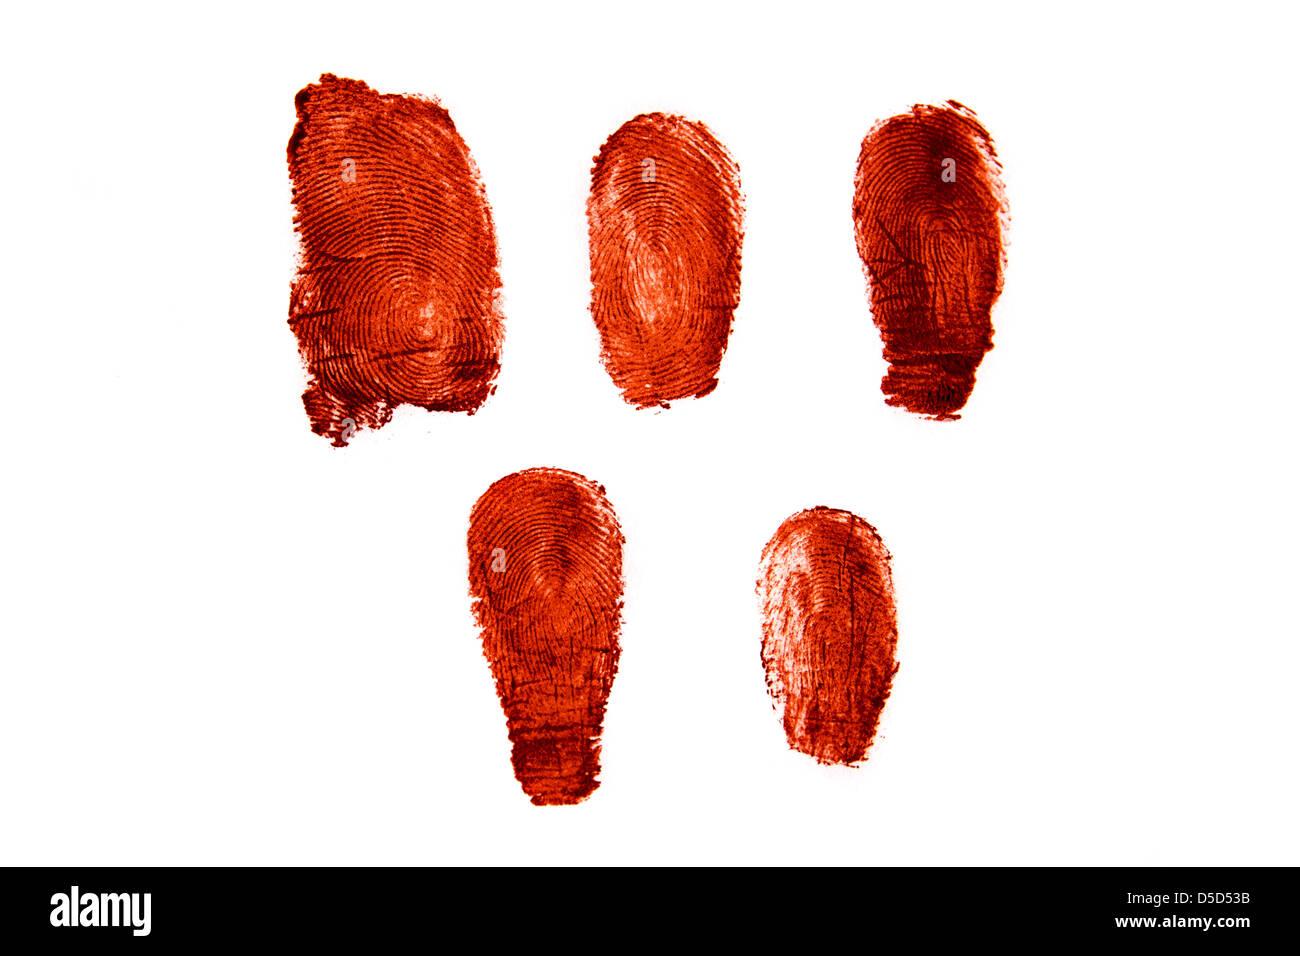 Bloody fingerprints isolated on white background - Stock Image